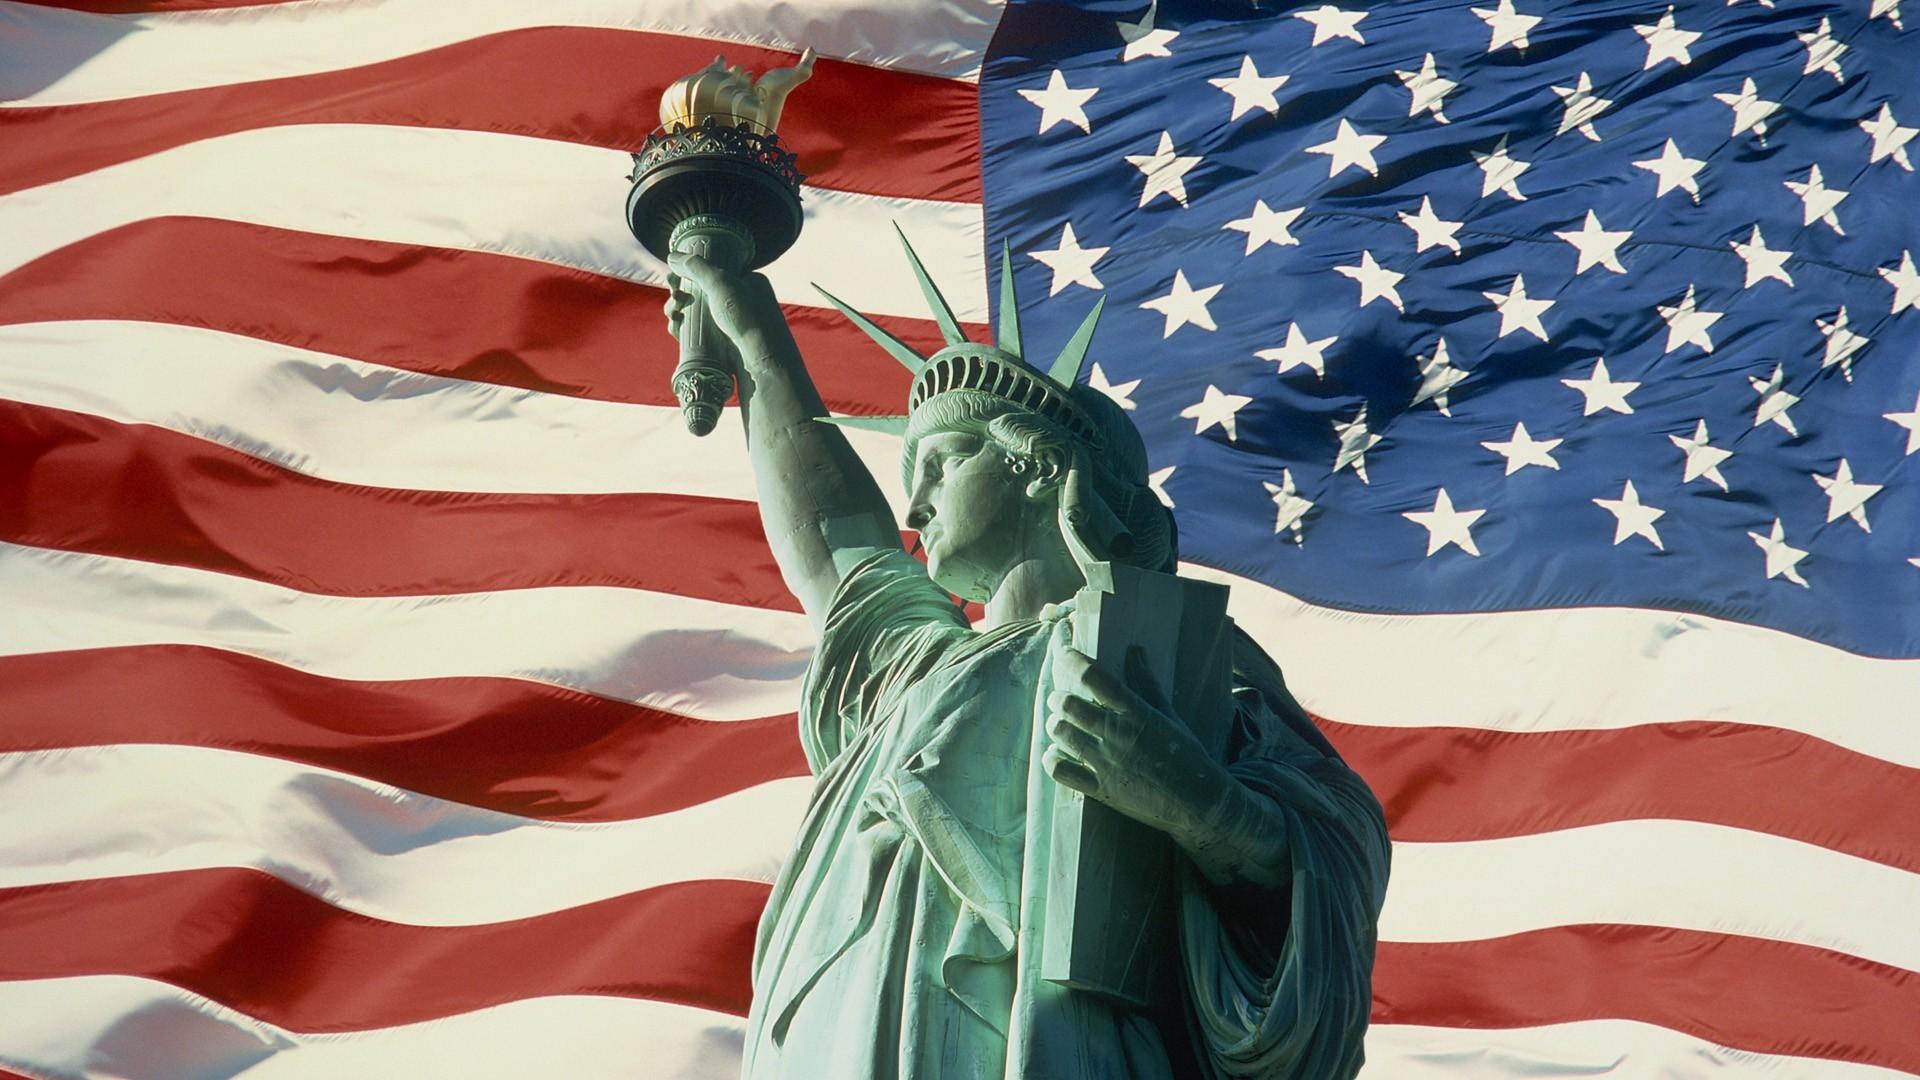 20+ Best HD American Flag Wallpapers